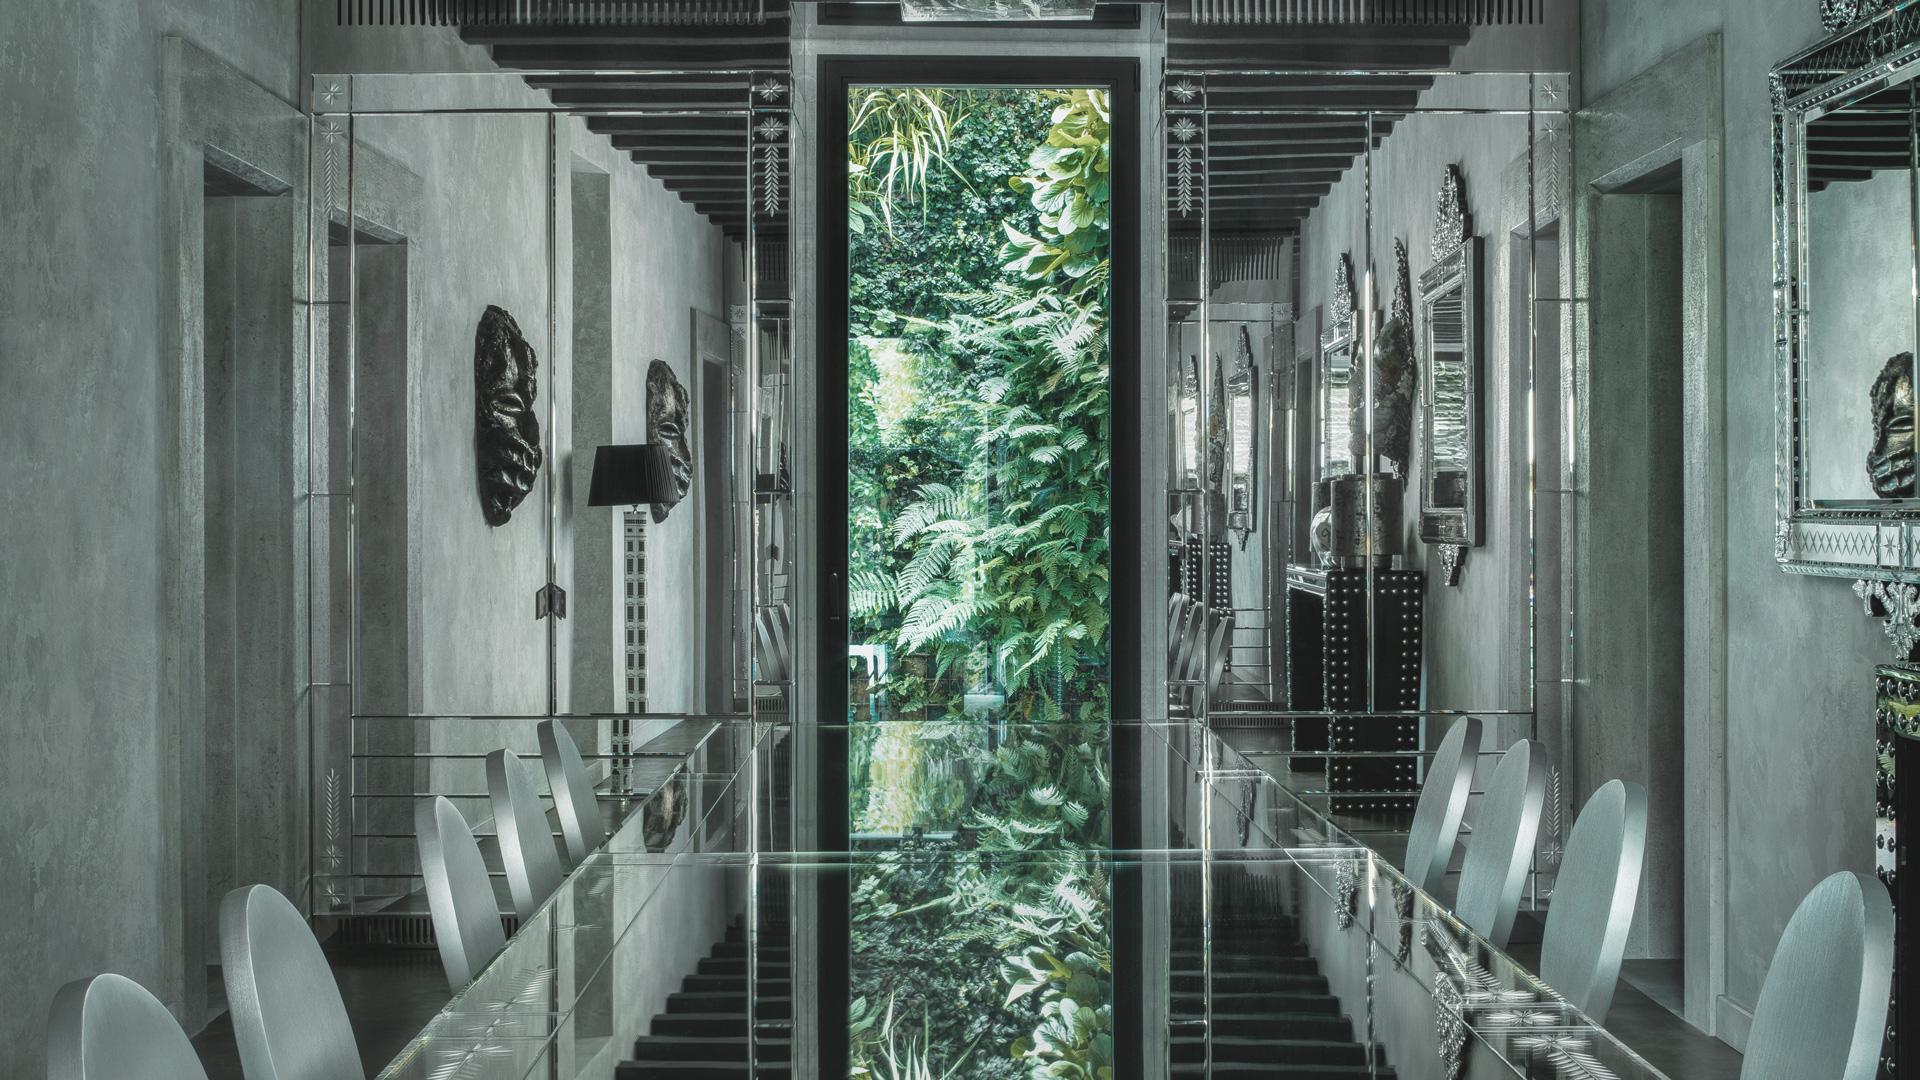 An elegant interior. Private home